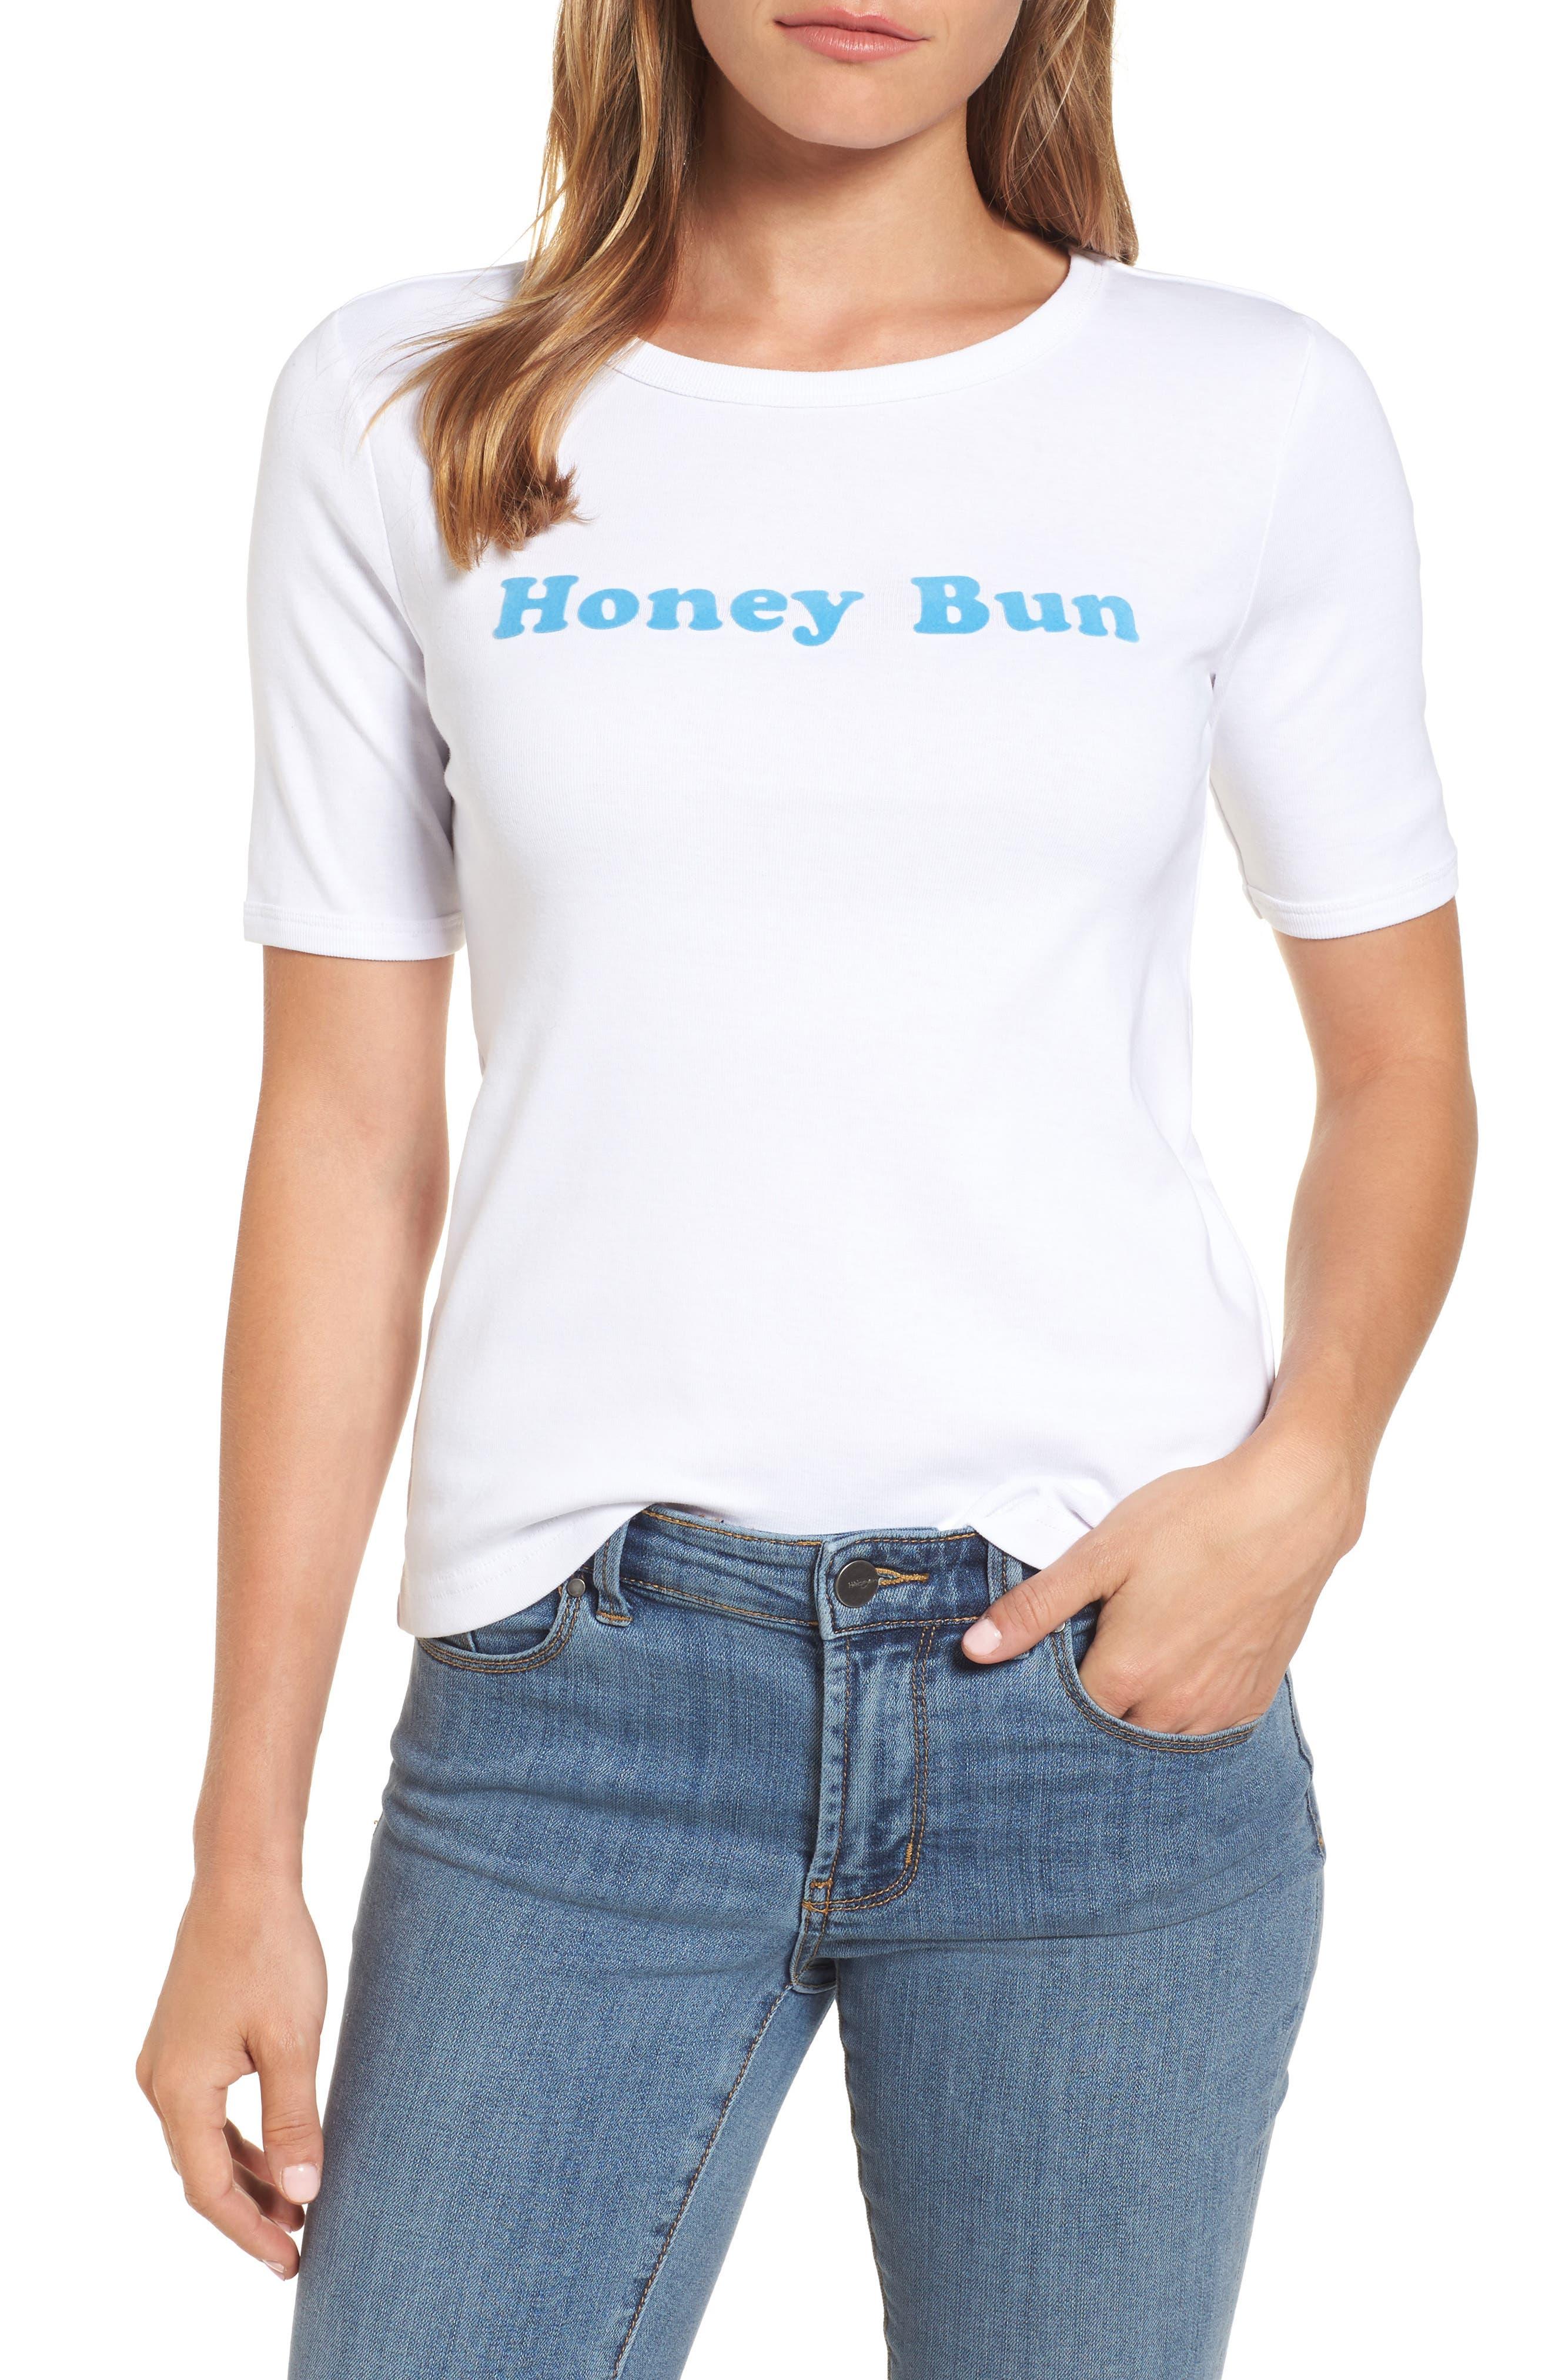 Honey Bun Tee,                             Main thumbnail 1, color,                             Willow White